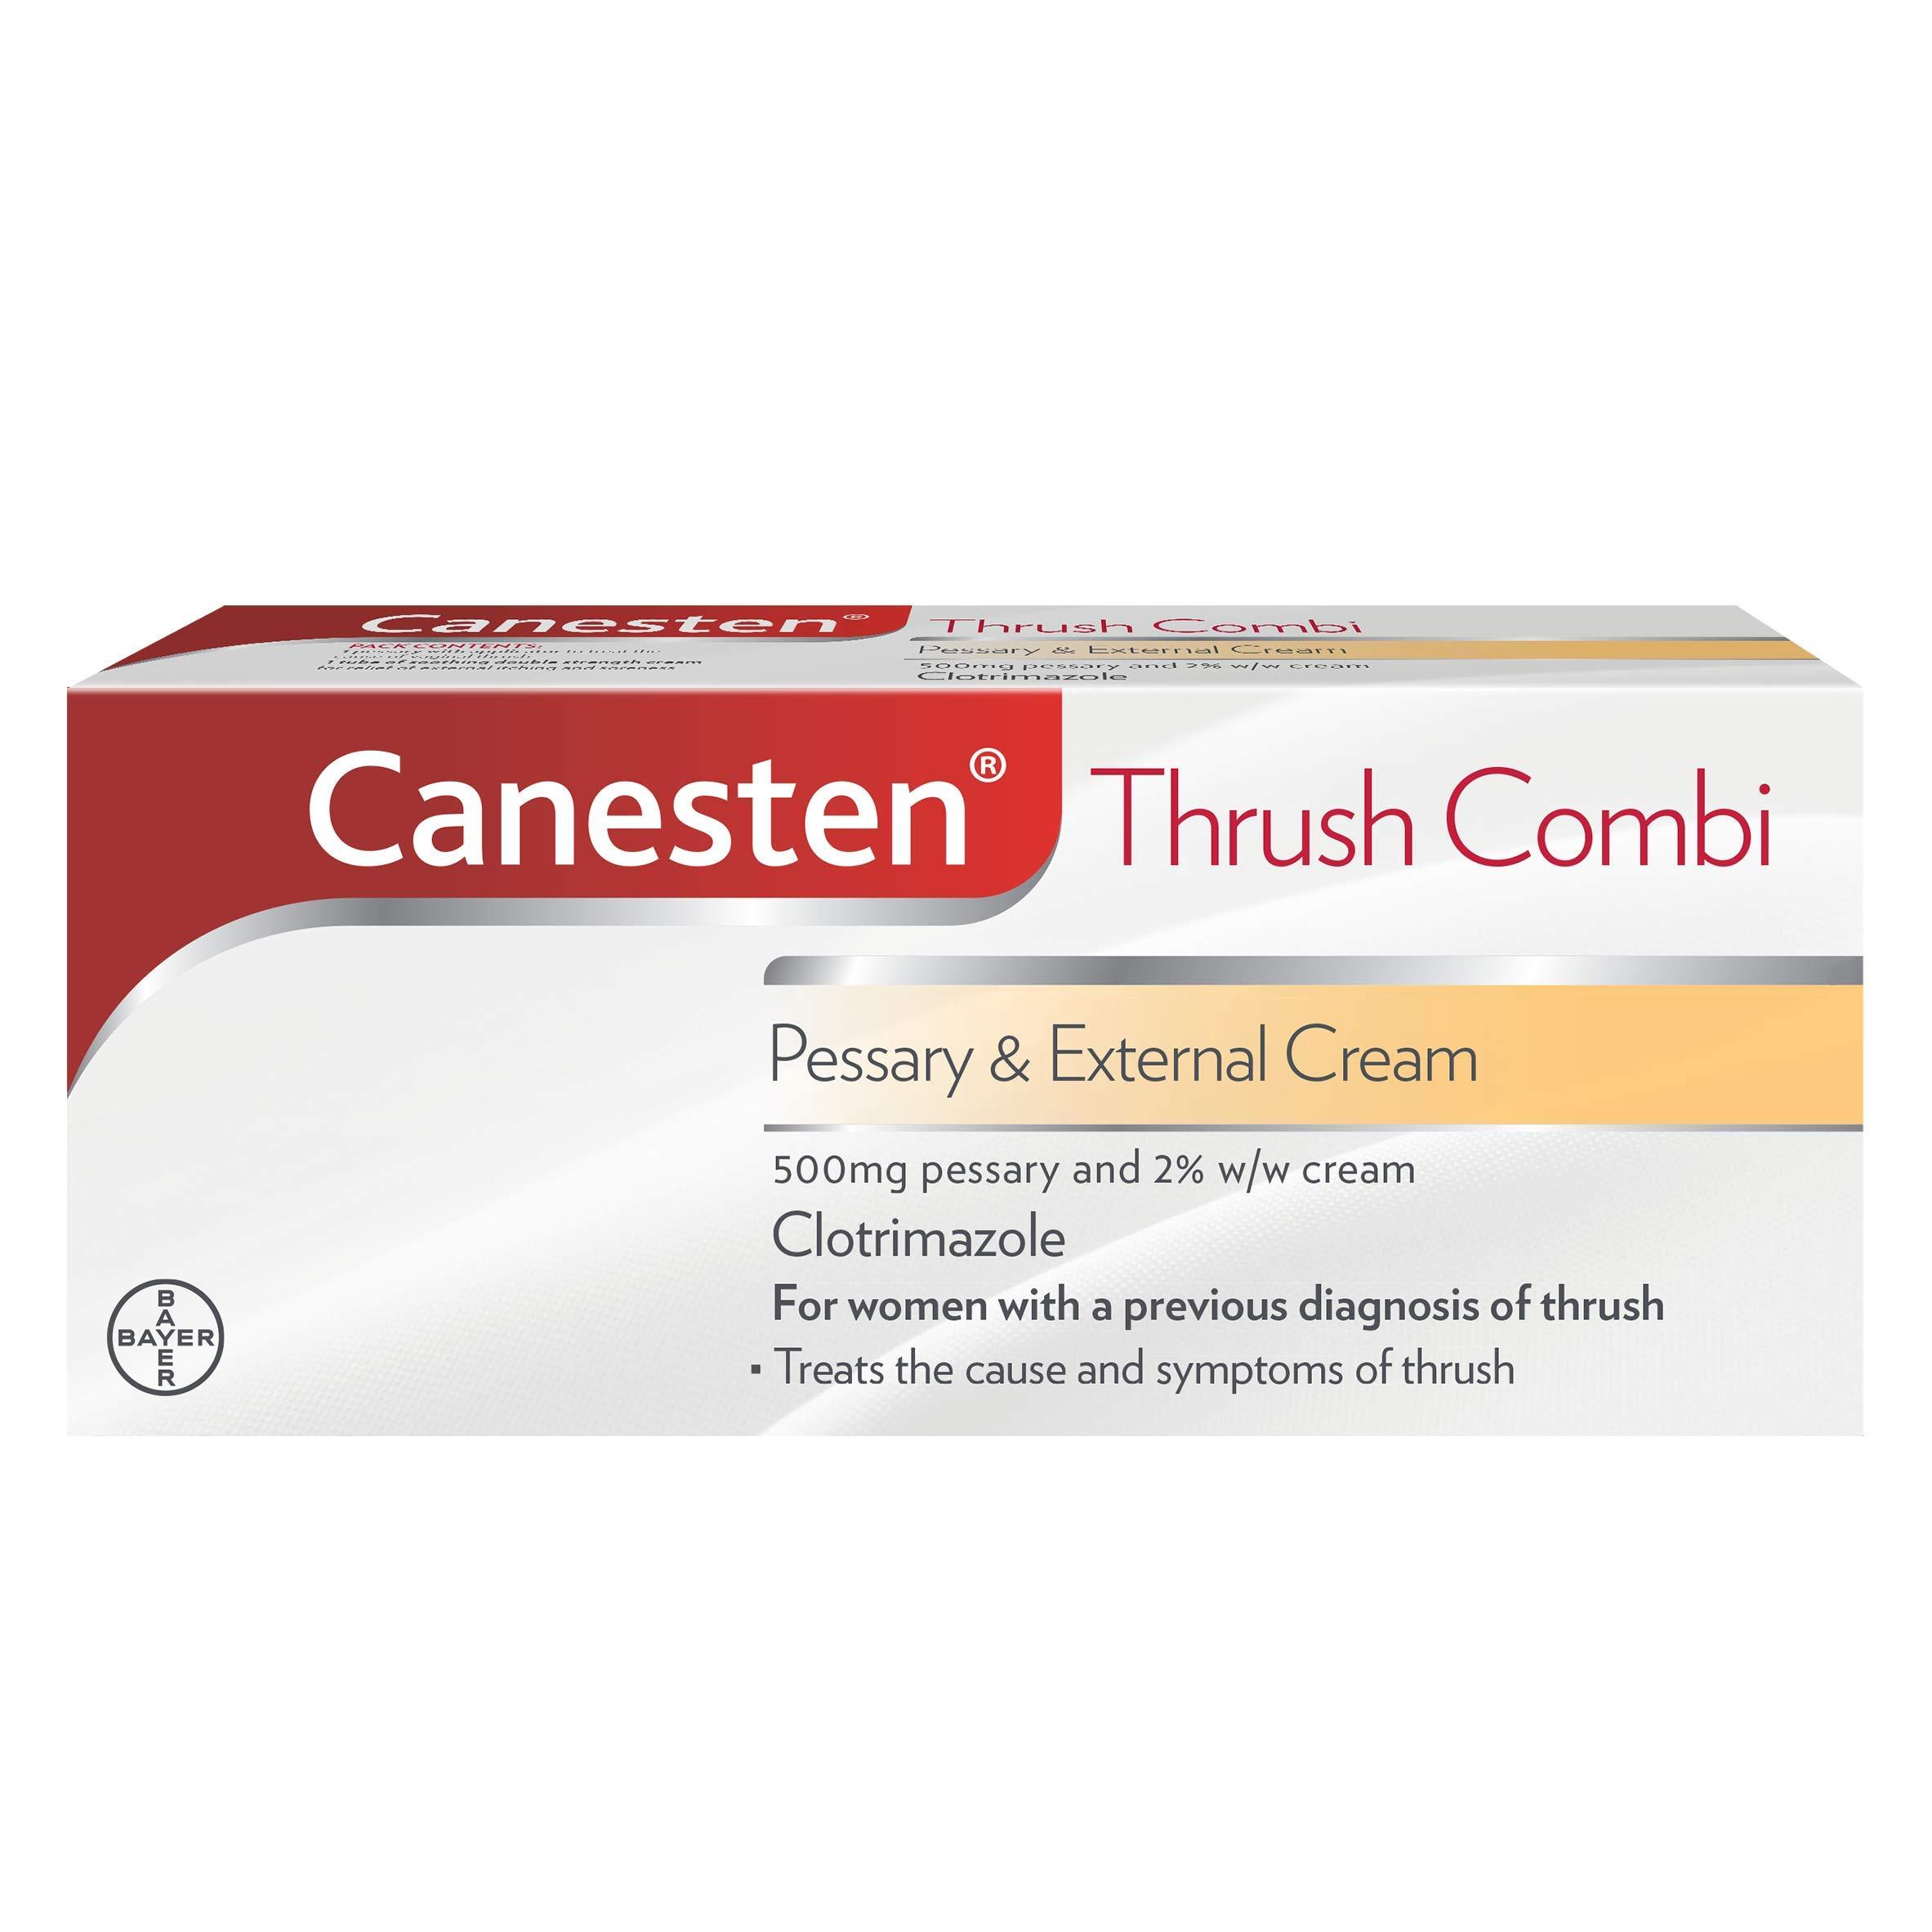 Canesten Thrush Combi Pessary & External Cream | Clotrimazole | Thrush Treatment | Complete Two-Step Thrush Treatment